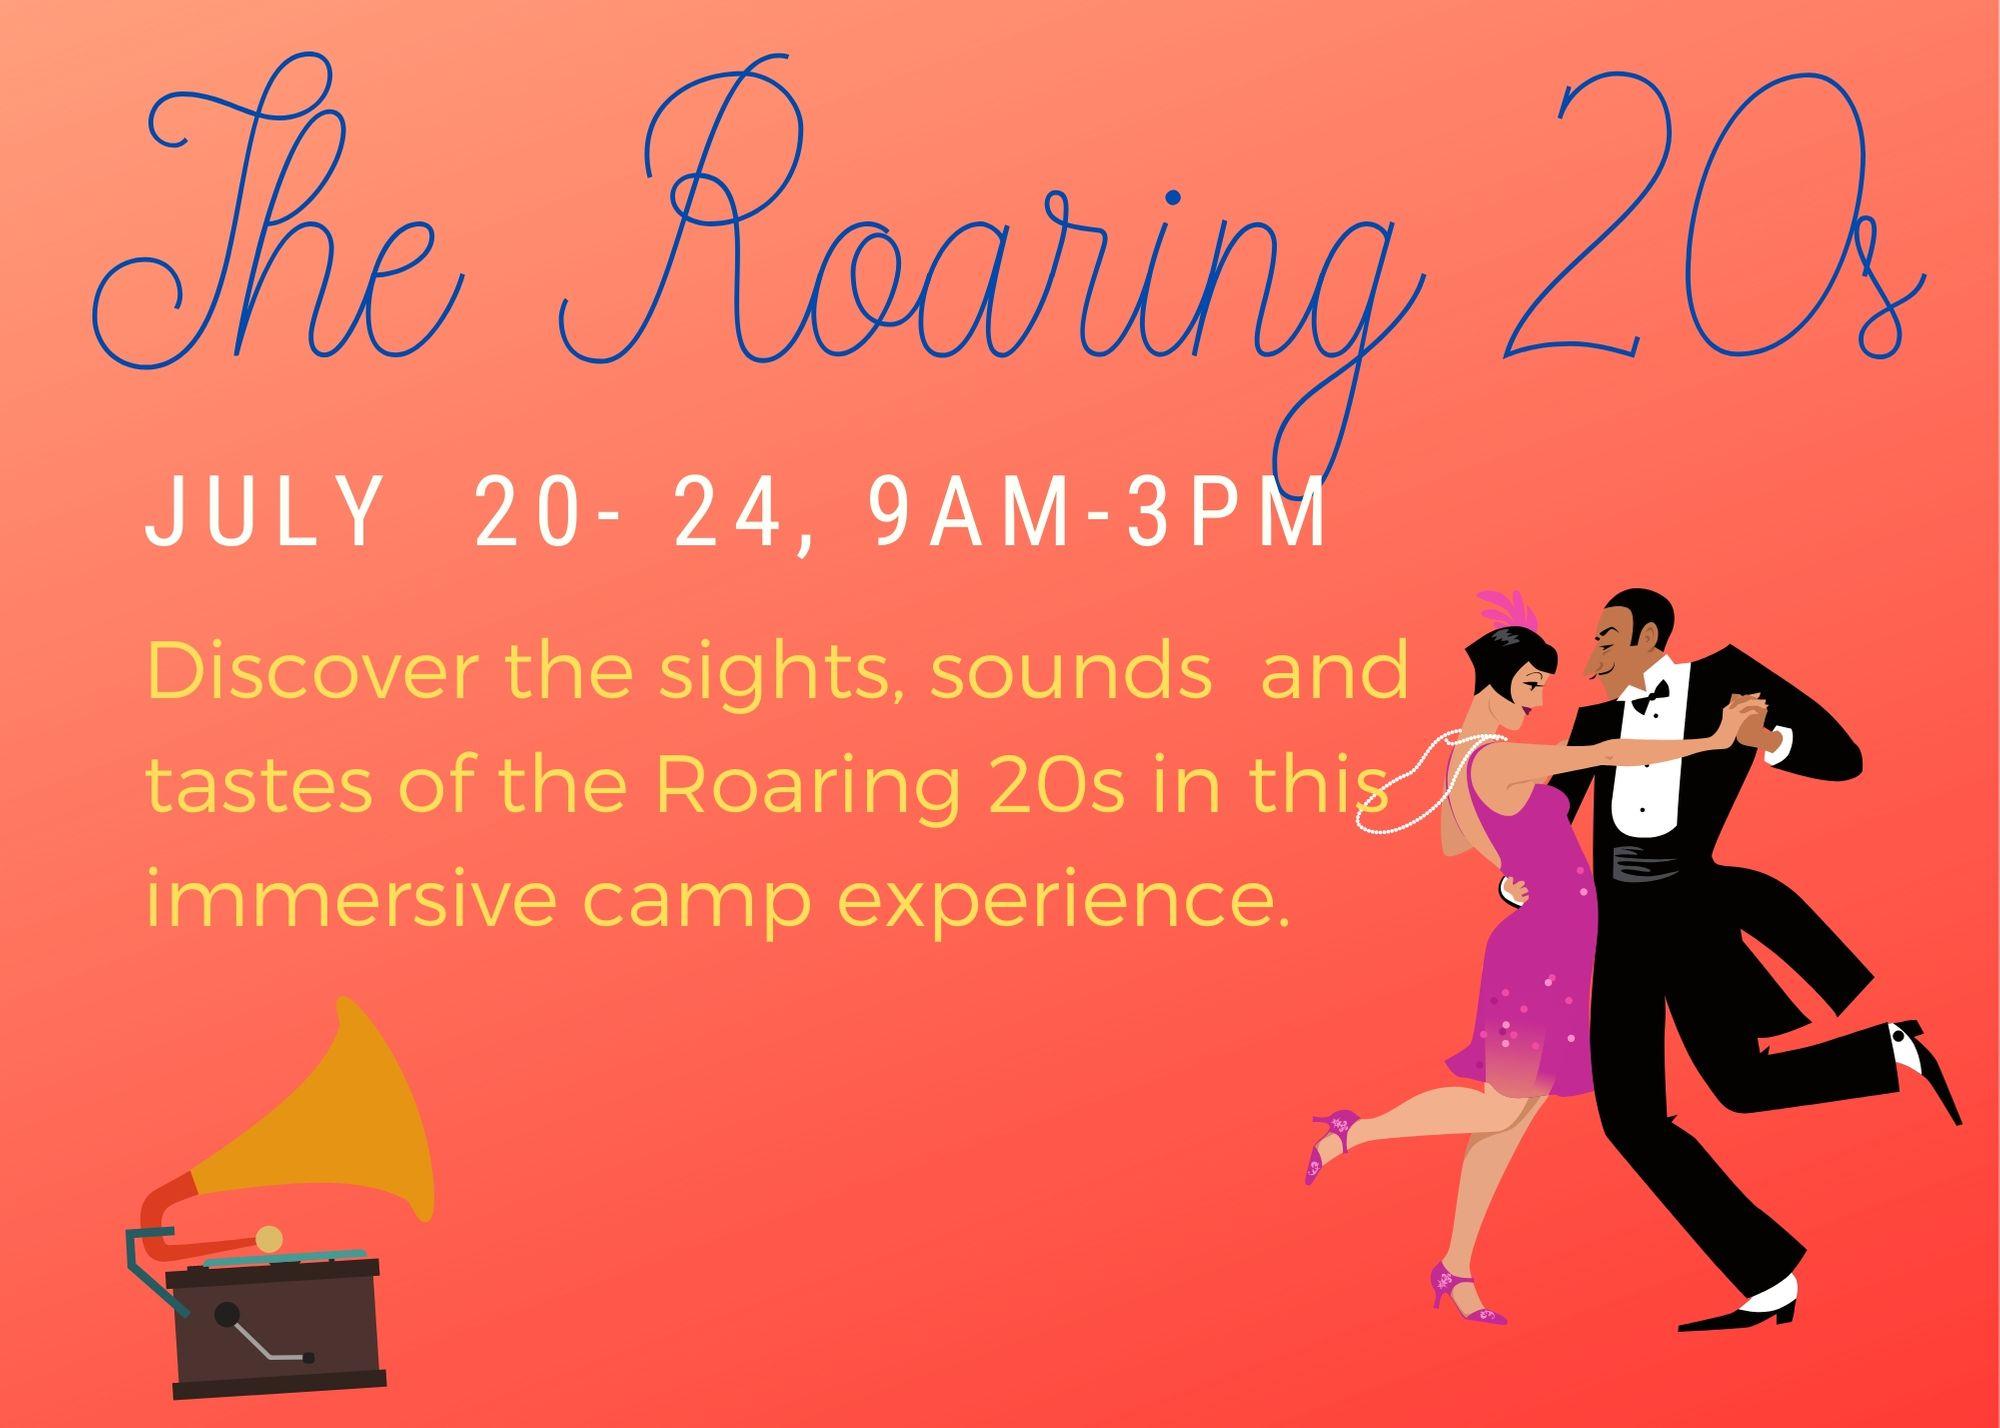 Roaring 20s Summer Camp Image